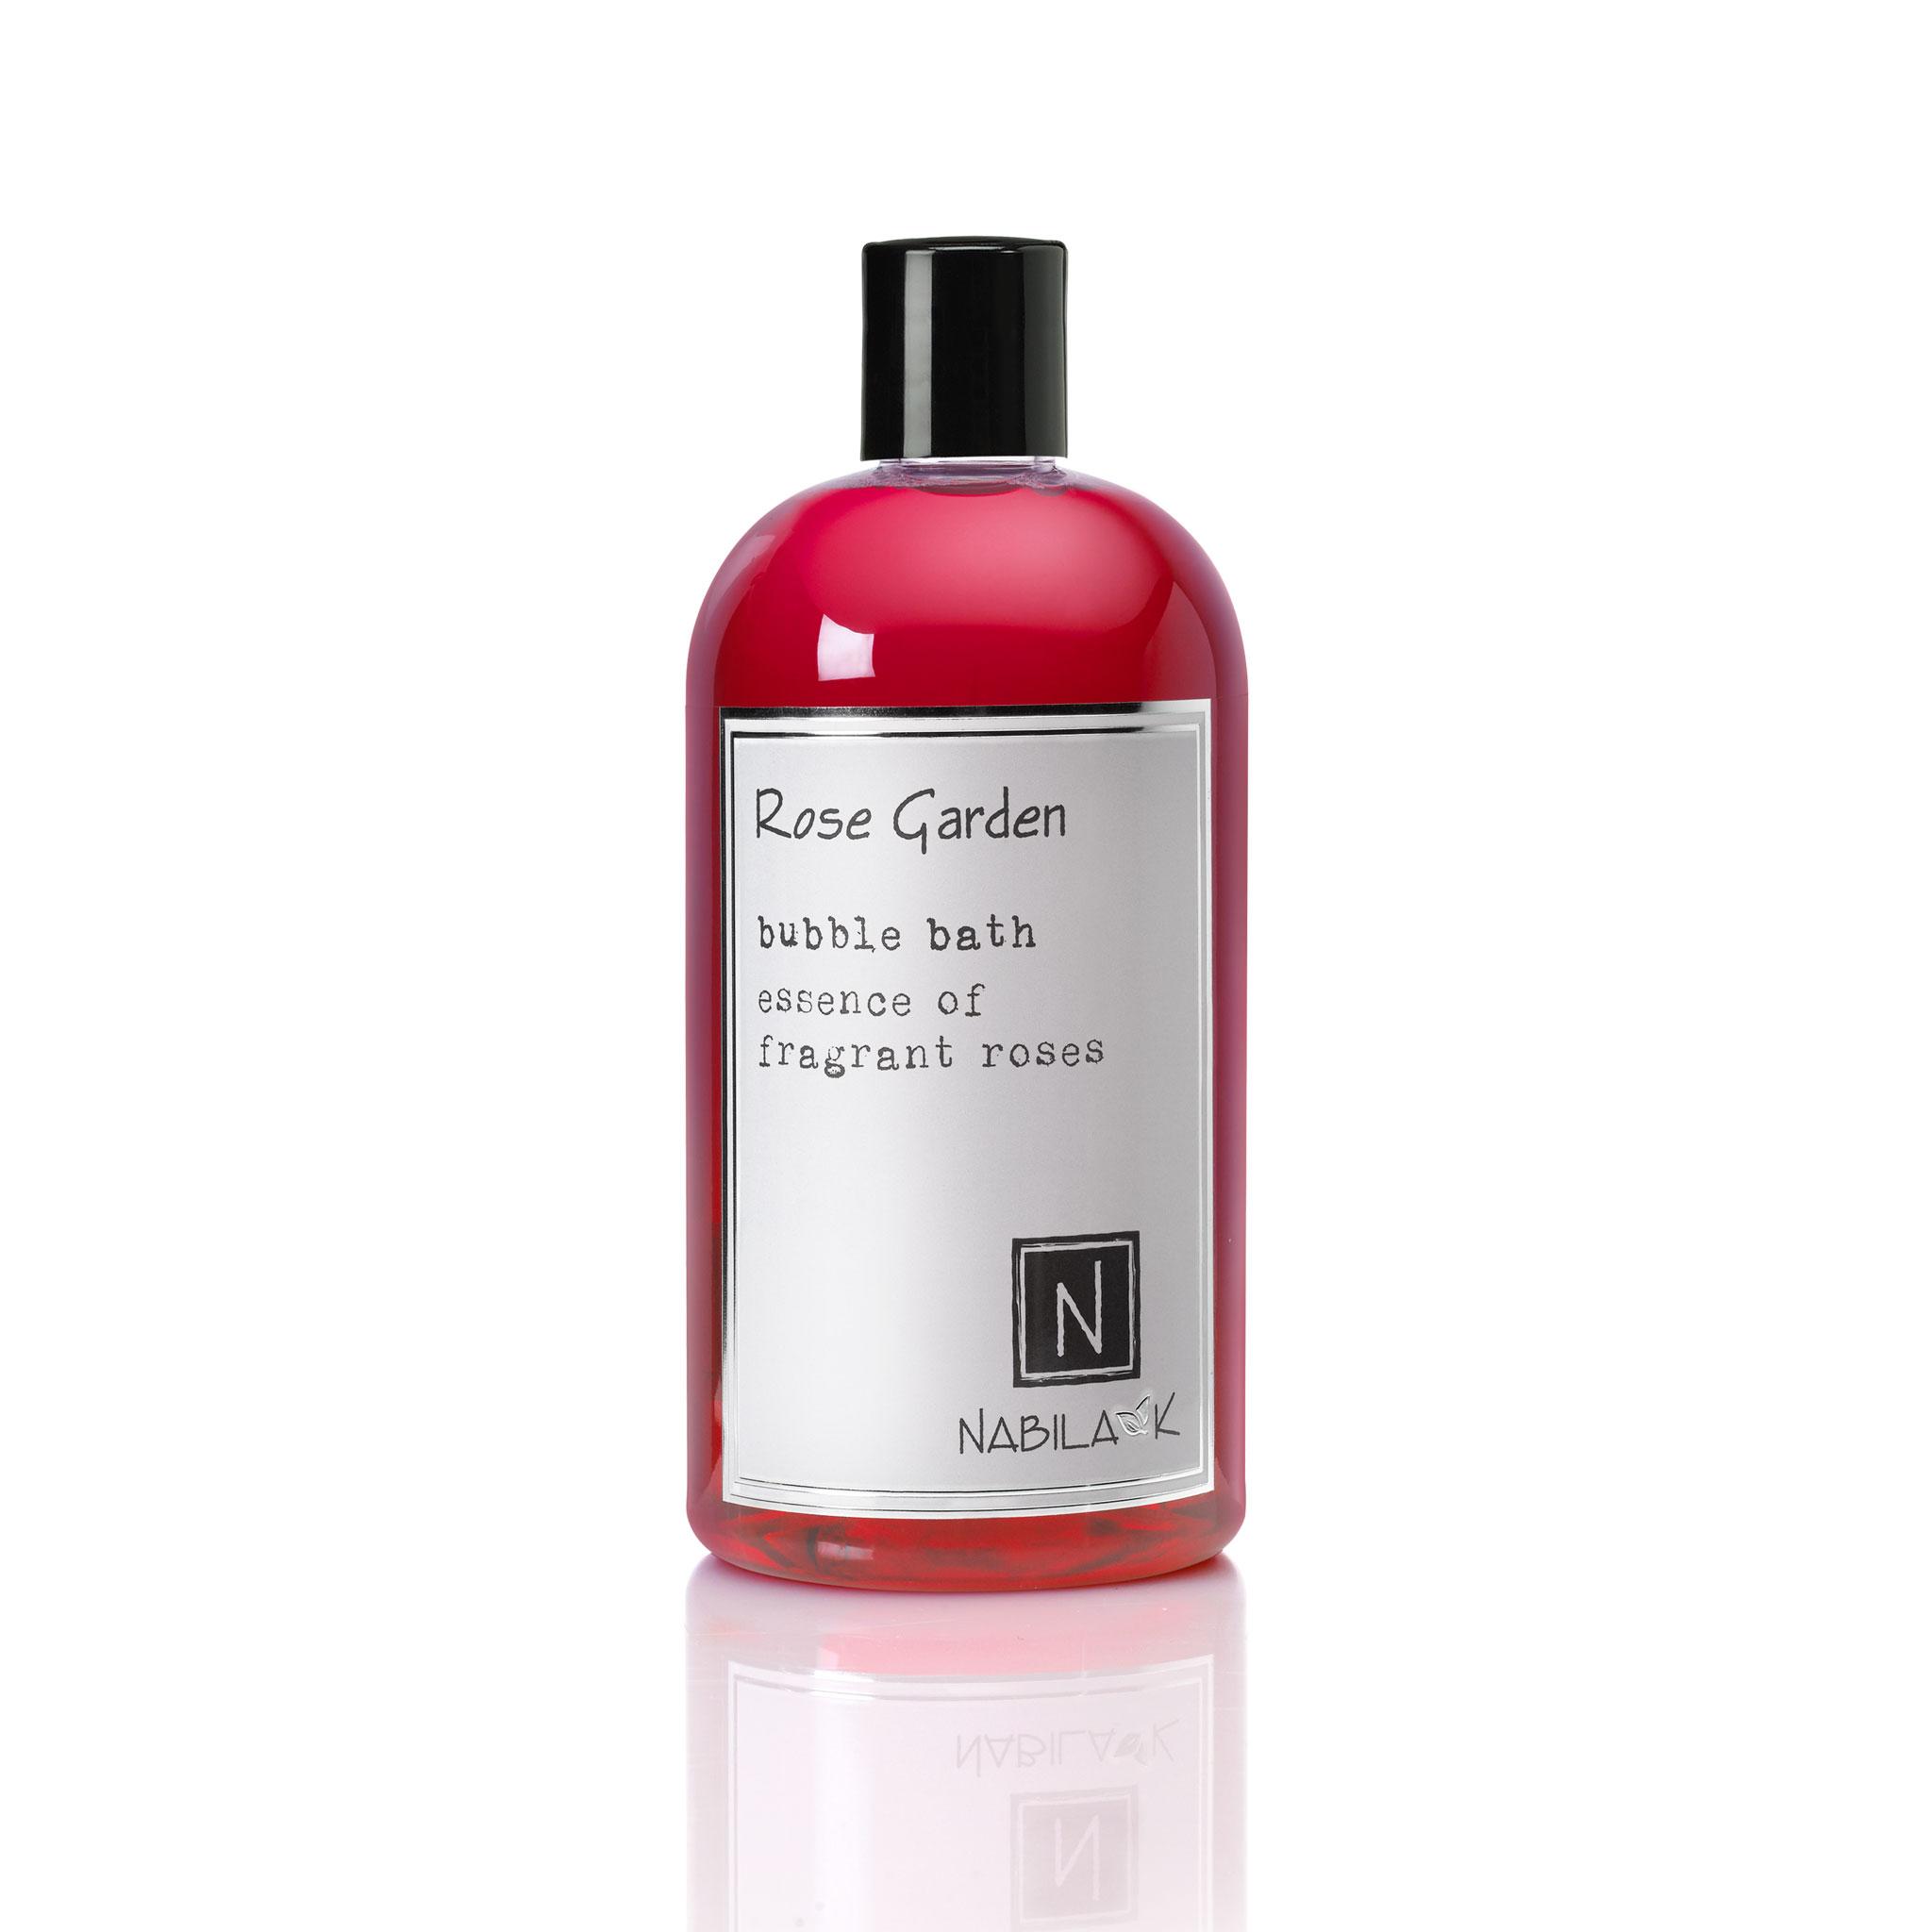 1 16oz bottle of rose garden bubble bath essence of fragrant roses